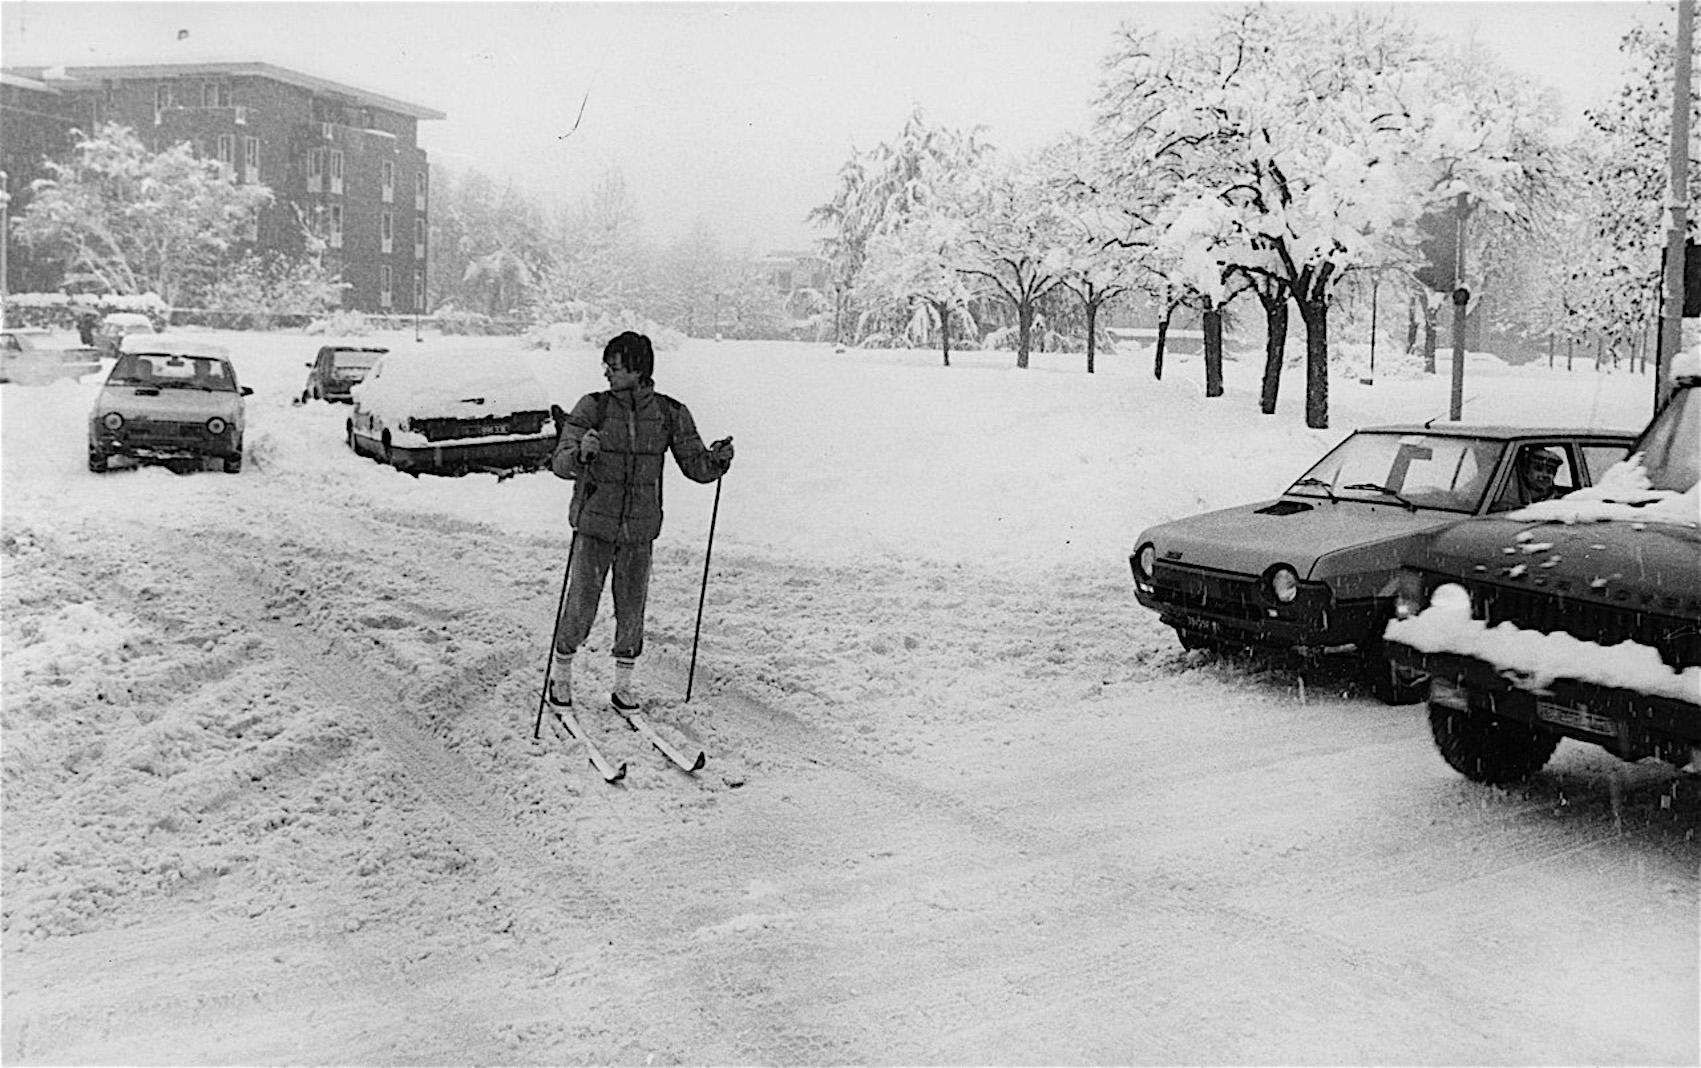 grande_freddo_1985_nevicata_storica